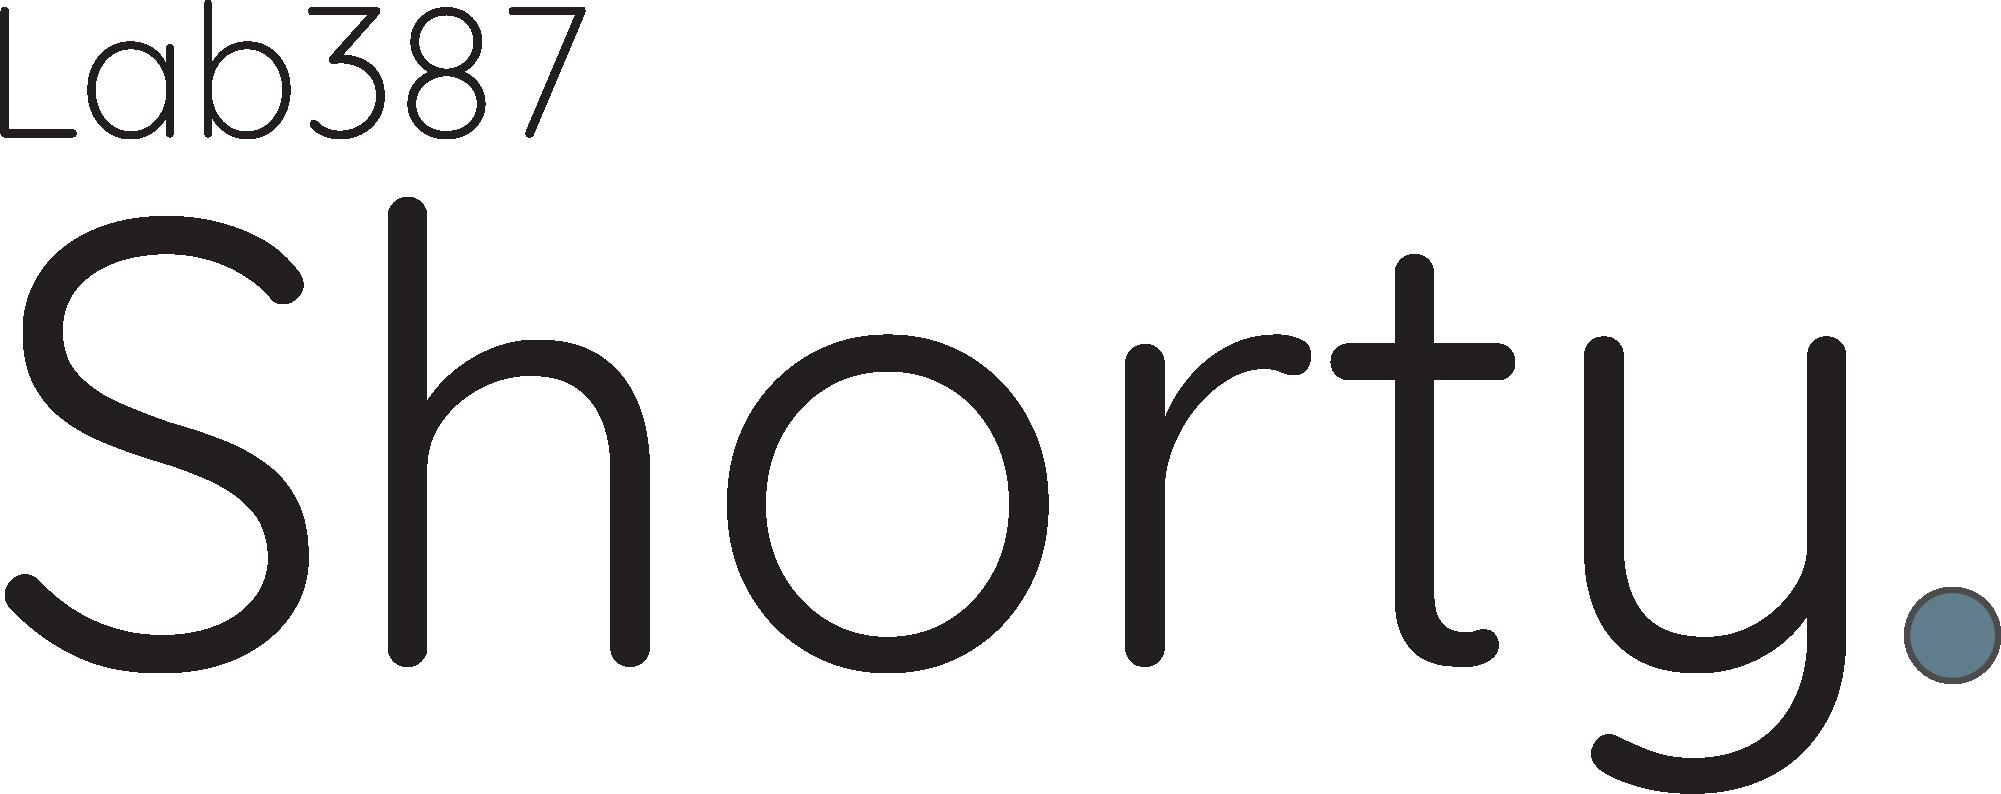 Lab387 logo